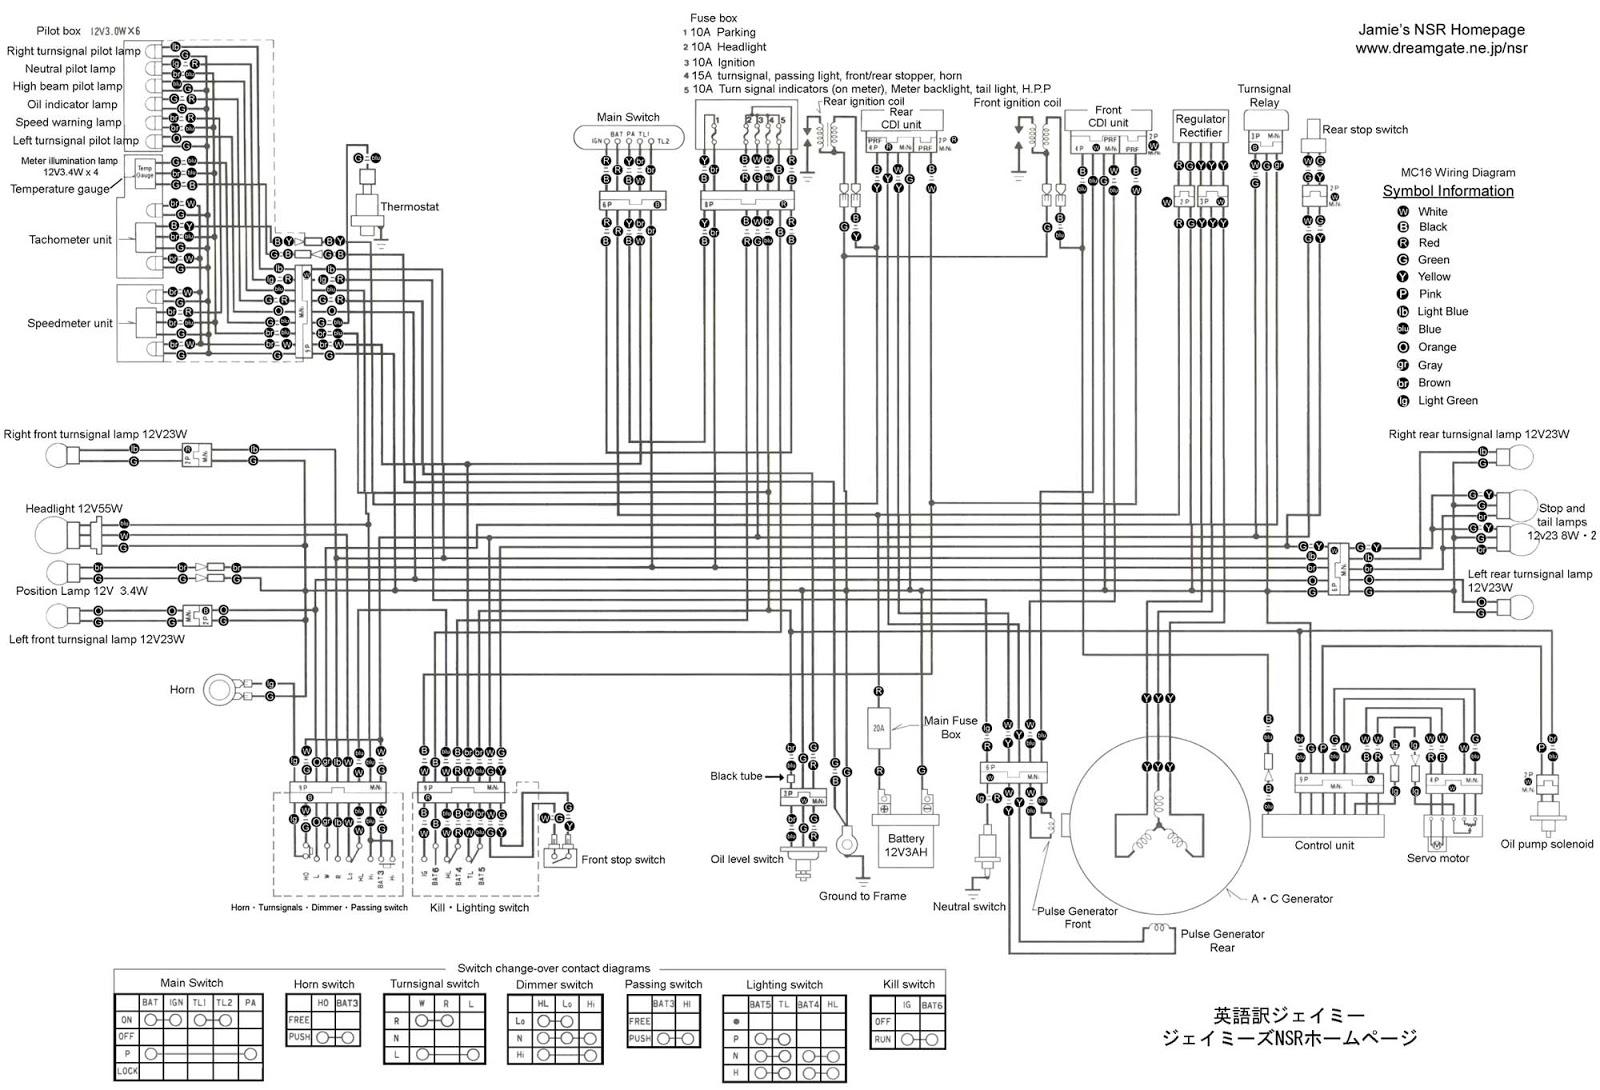 Wiring Diagram Honda Nsr 125 - Wiring Diagramspsicologoafaenza.it